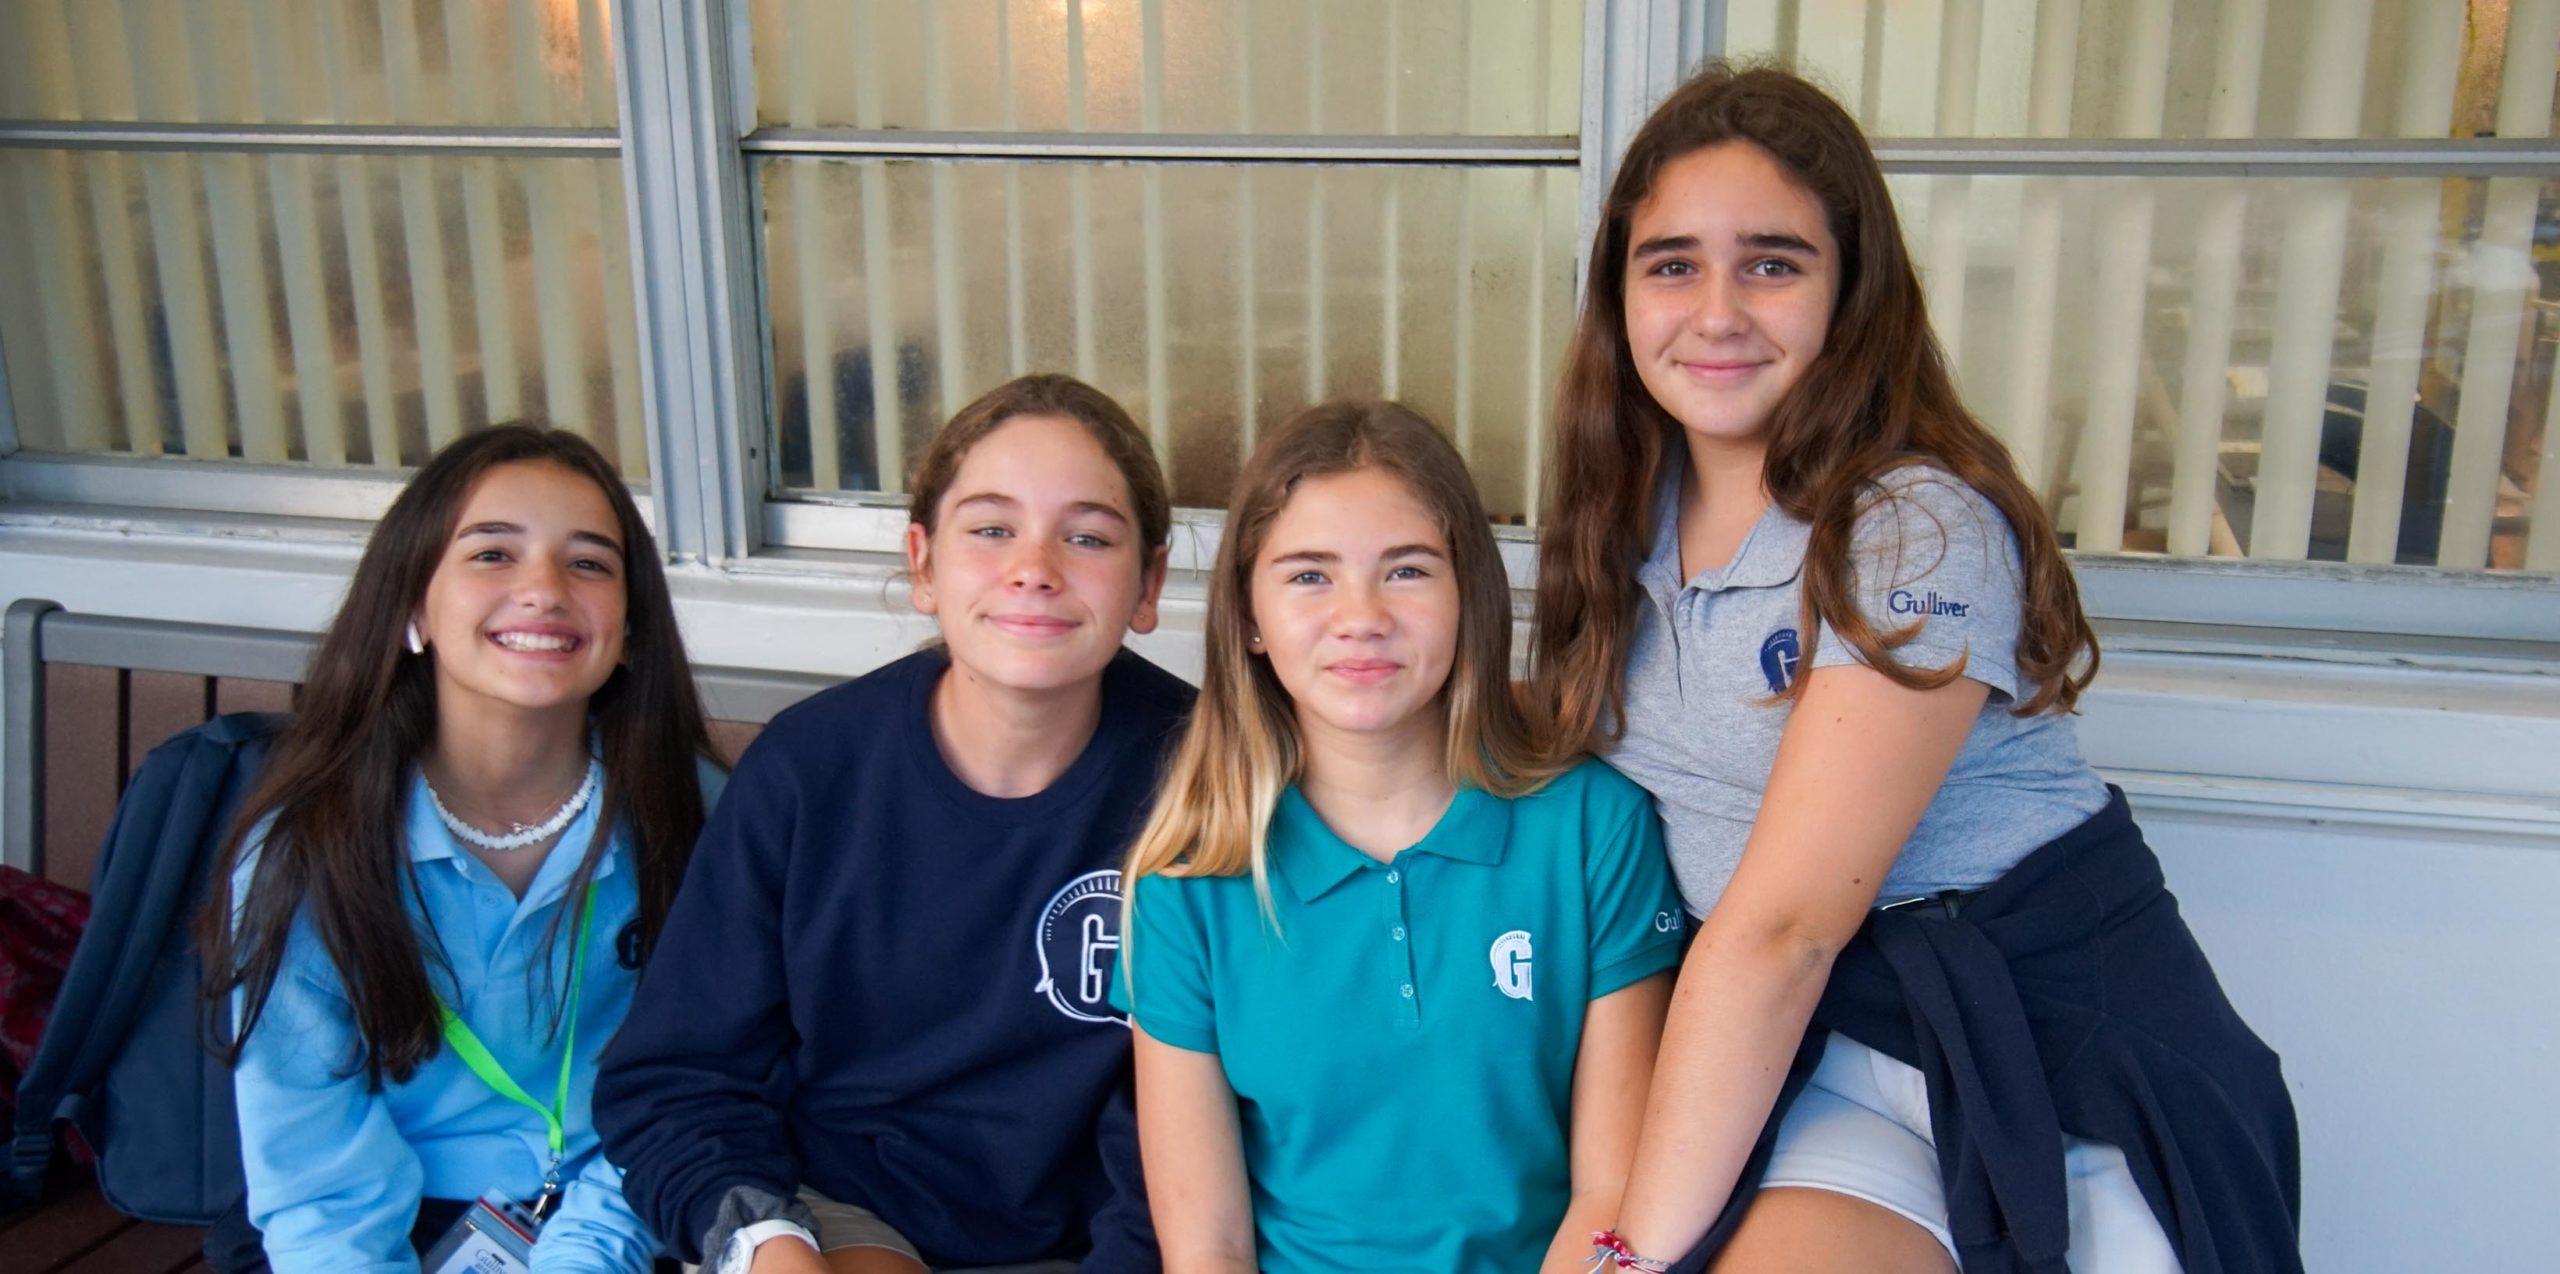 Four girls smiling outside